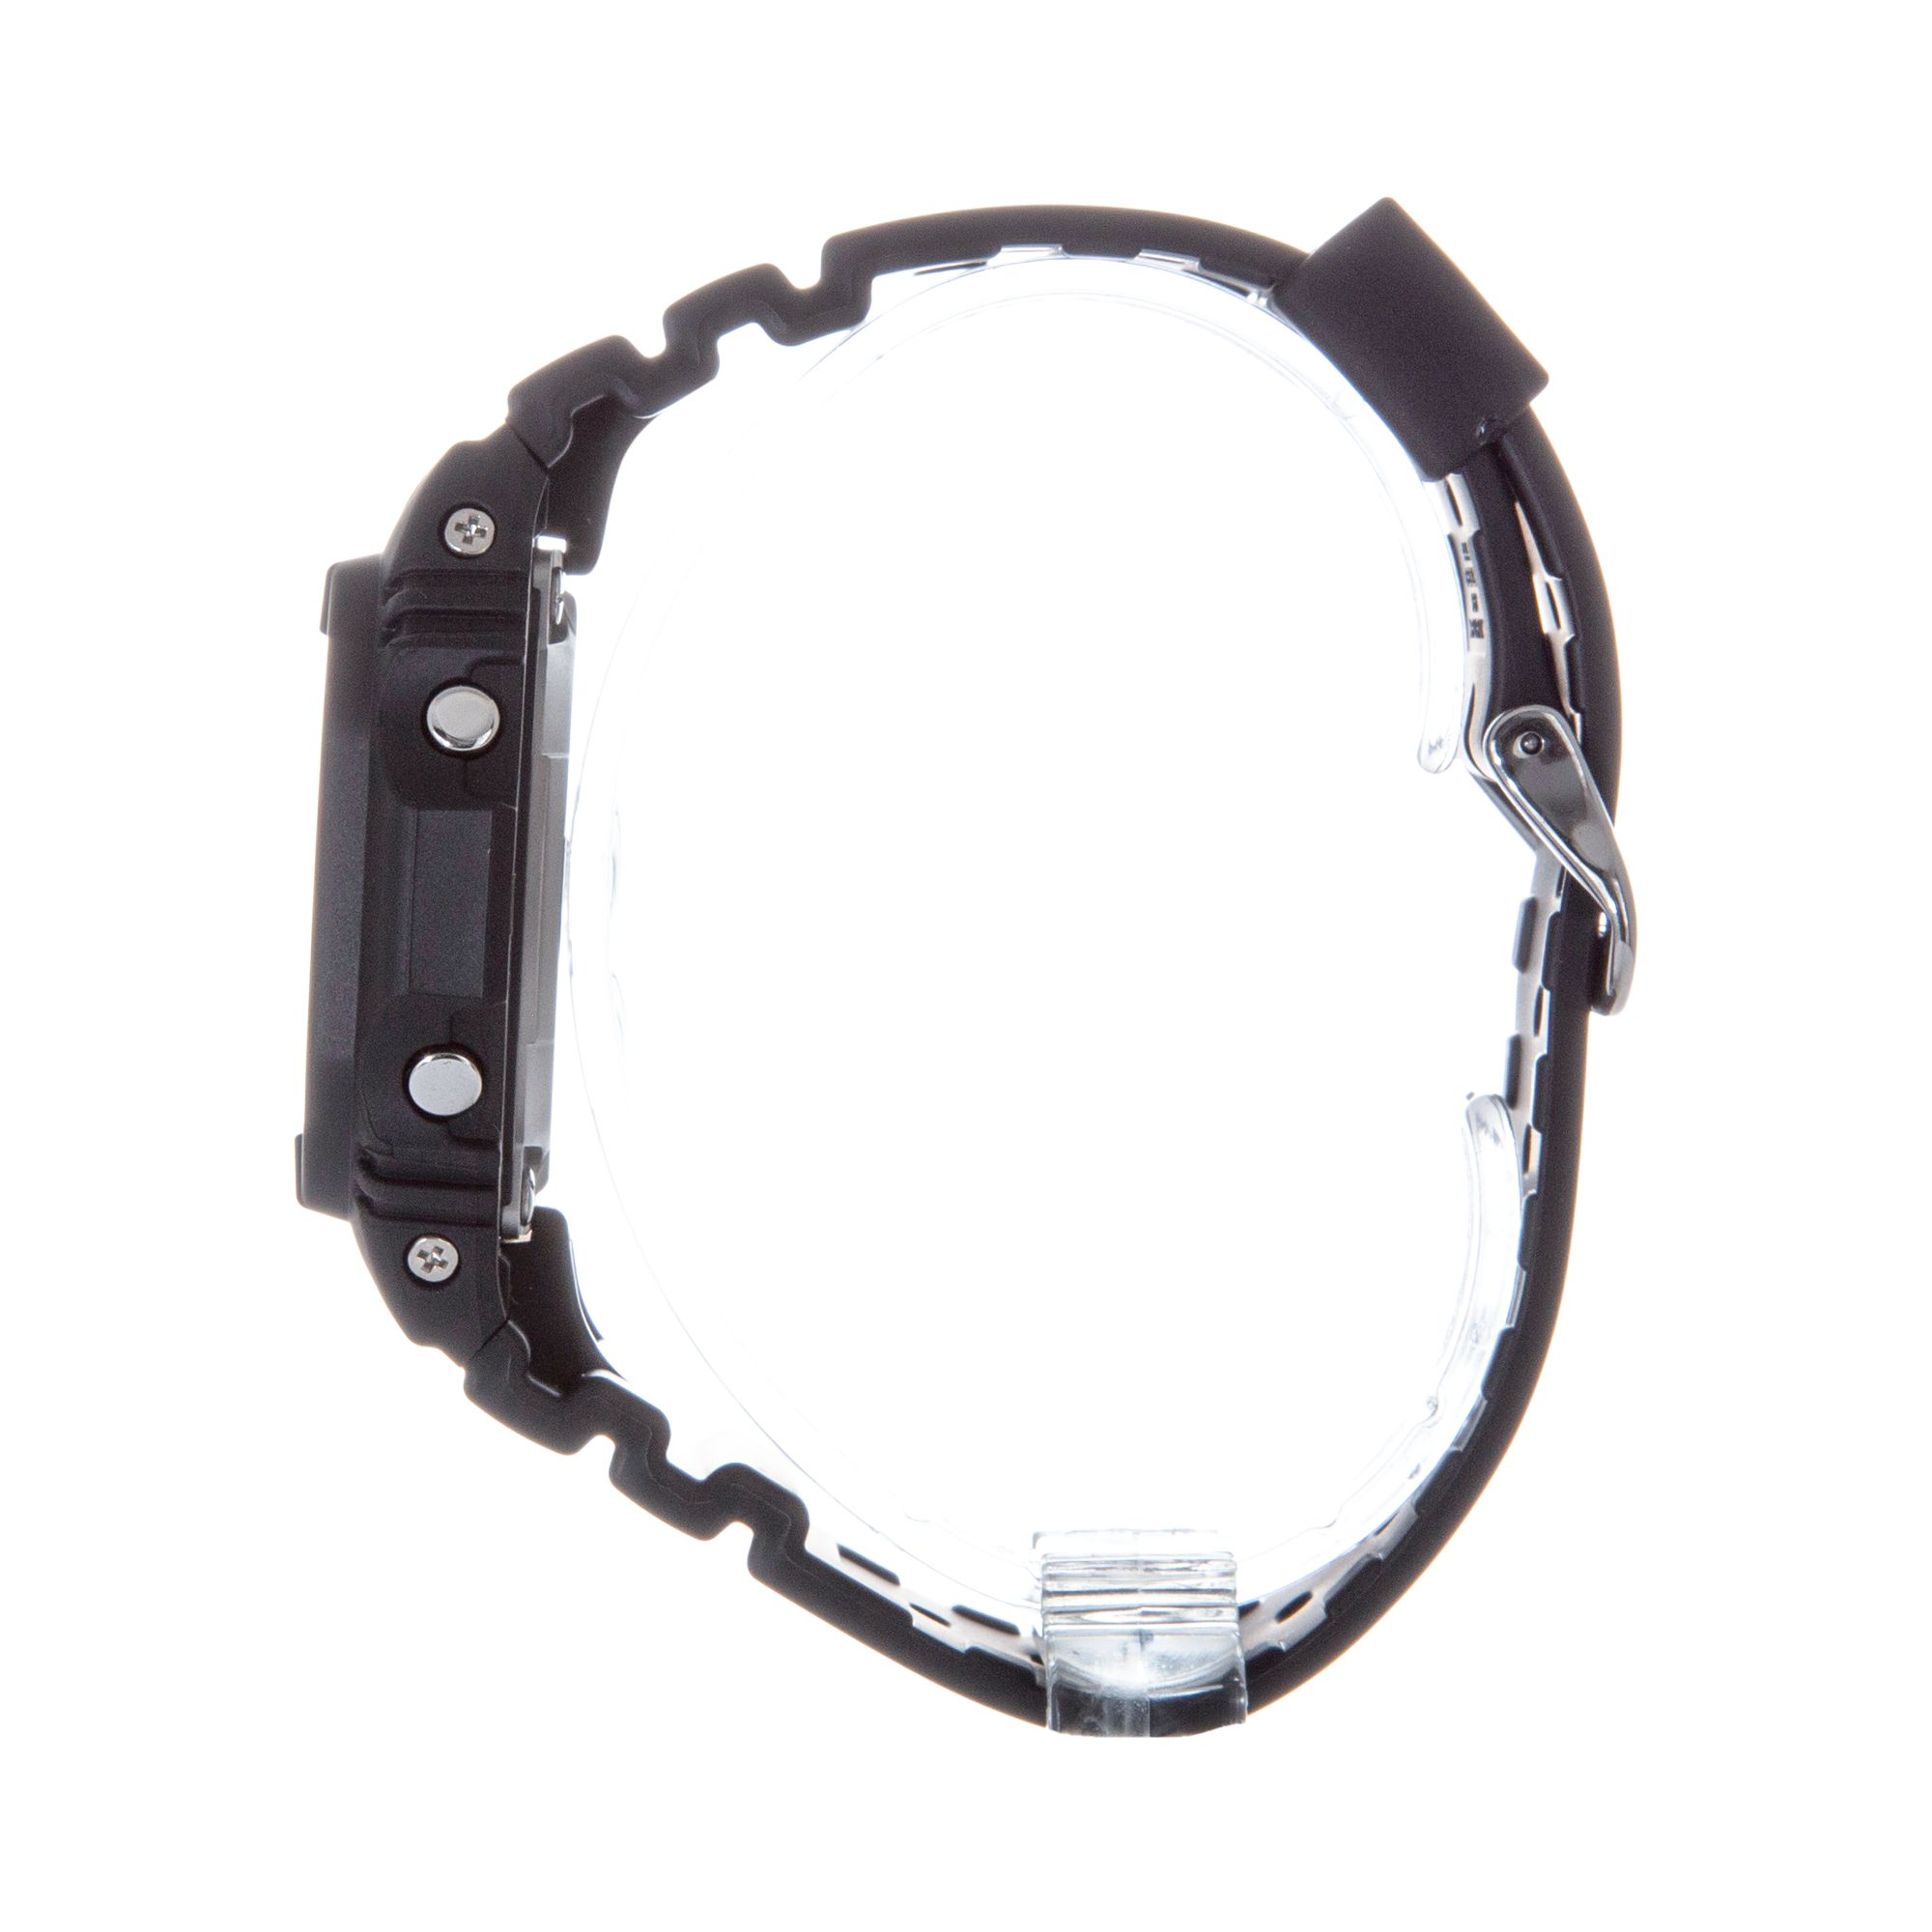 G-Shock Casio Armbanduhr GW-M5610-1ER Solar Funk Uhr